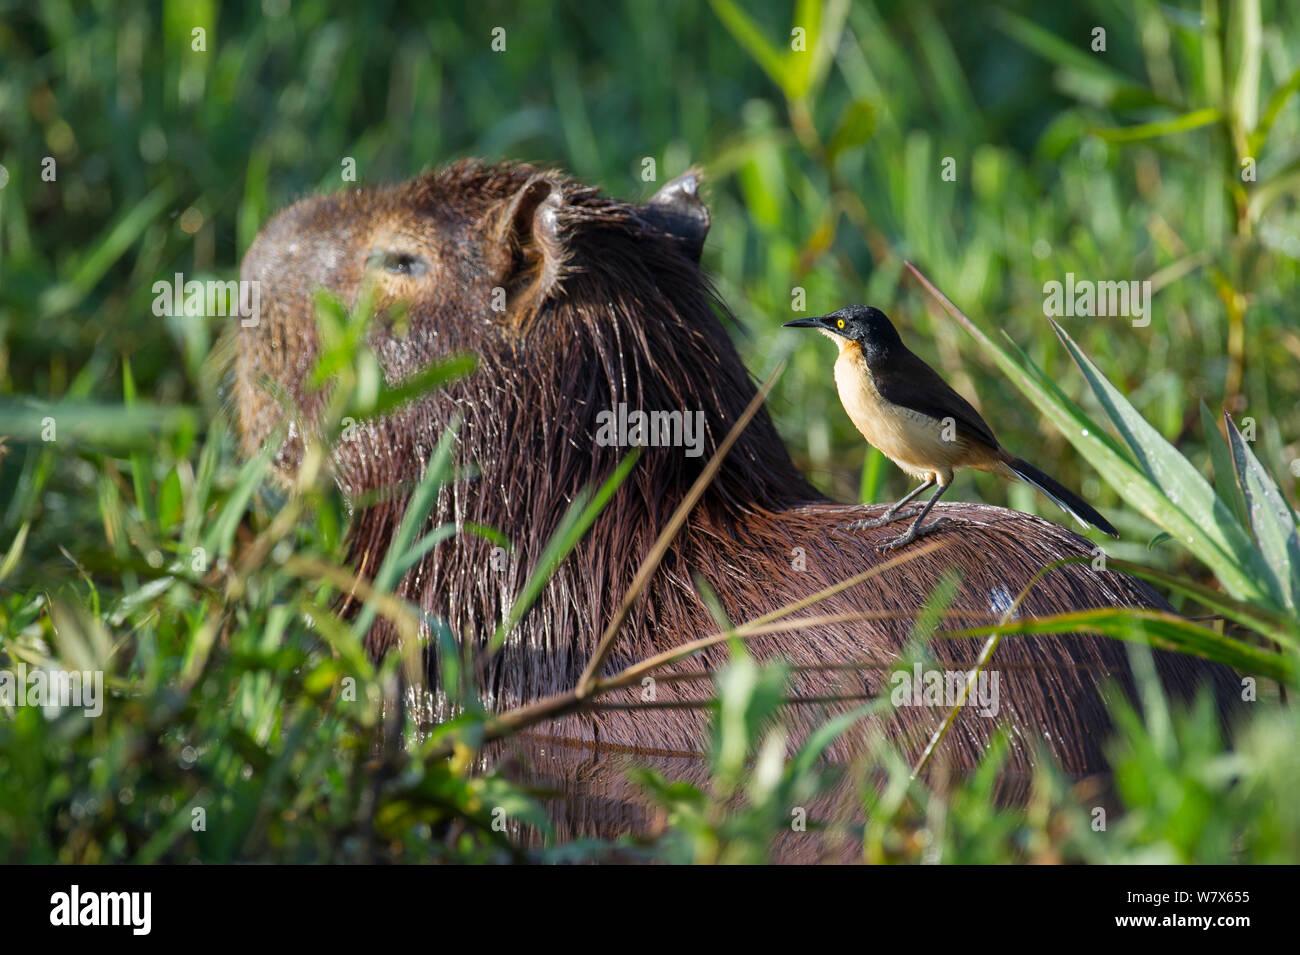 Black-capped Donacobius (Donacobius atricapilla) perched on back of Capybara (Hydrochoerus hydrochaeris)  Capybara, Mato Grosso, Pantanal, Brazil.  July. Stock Photo